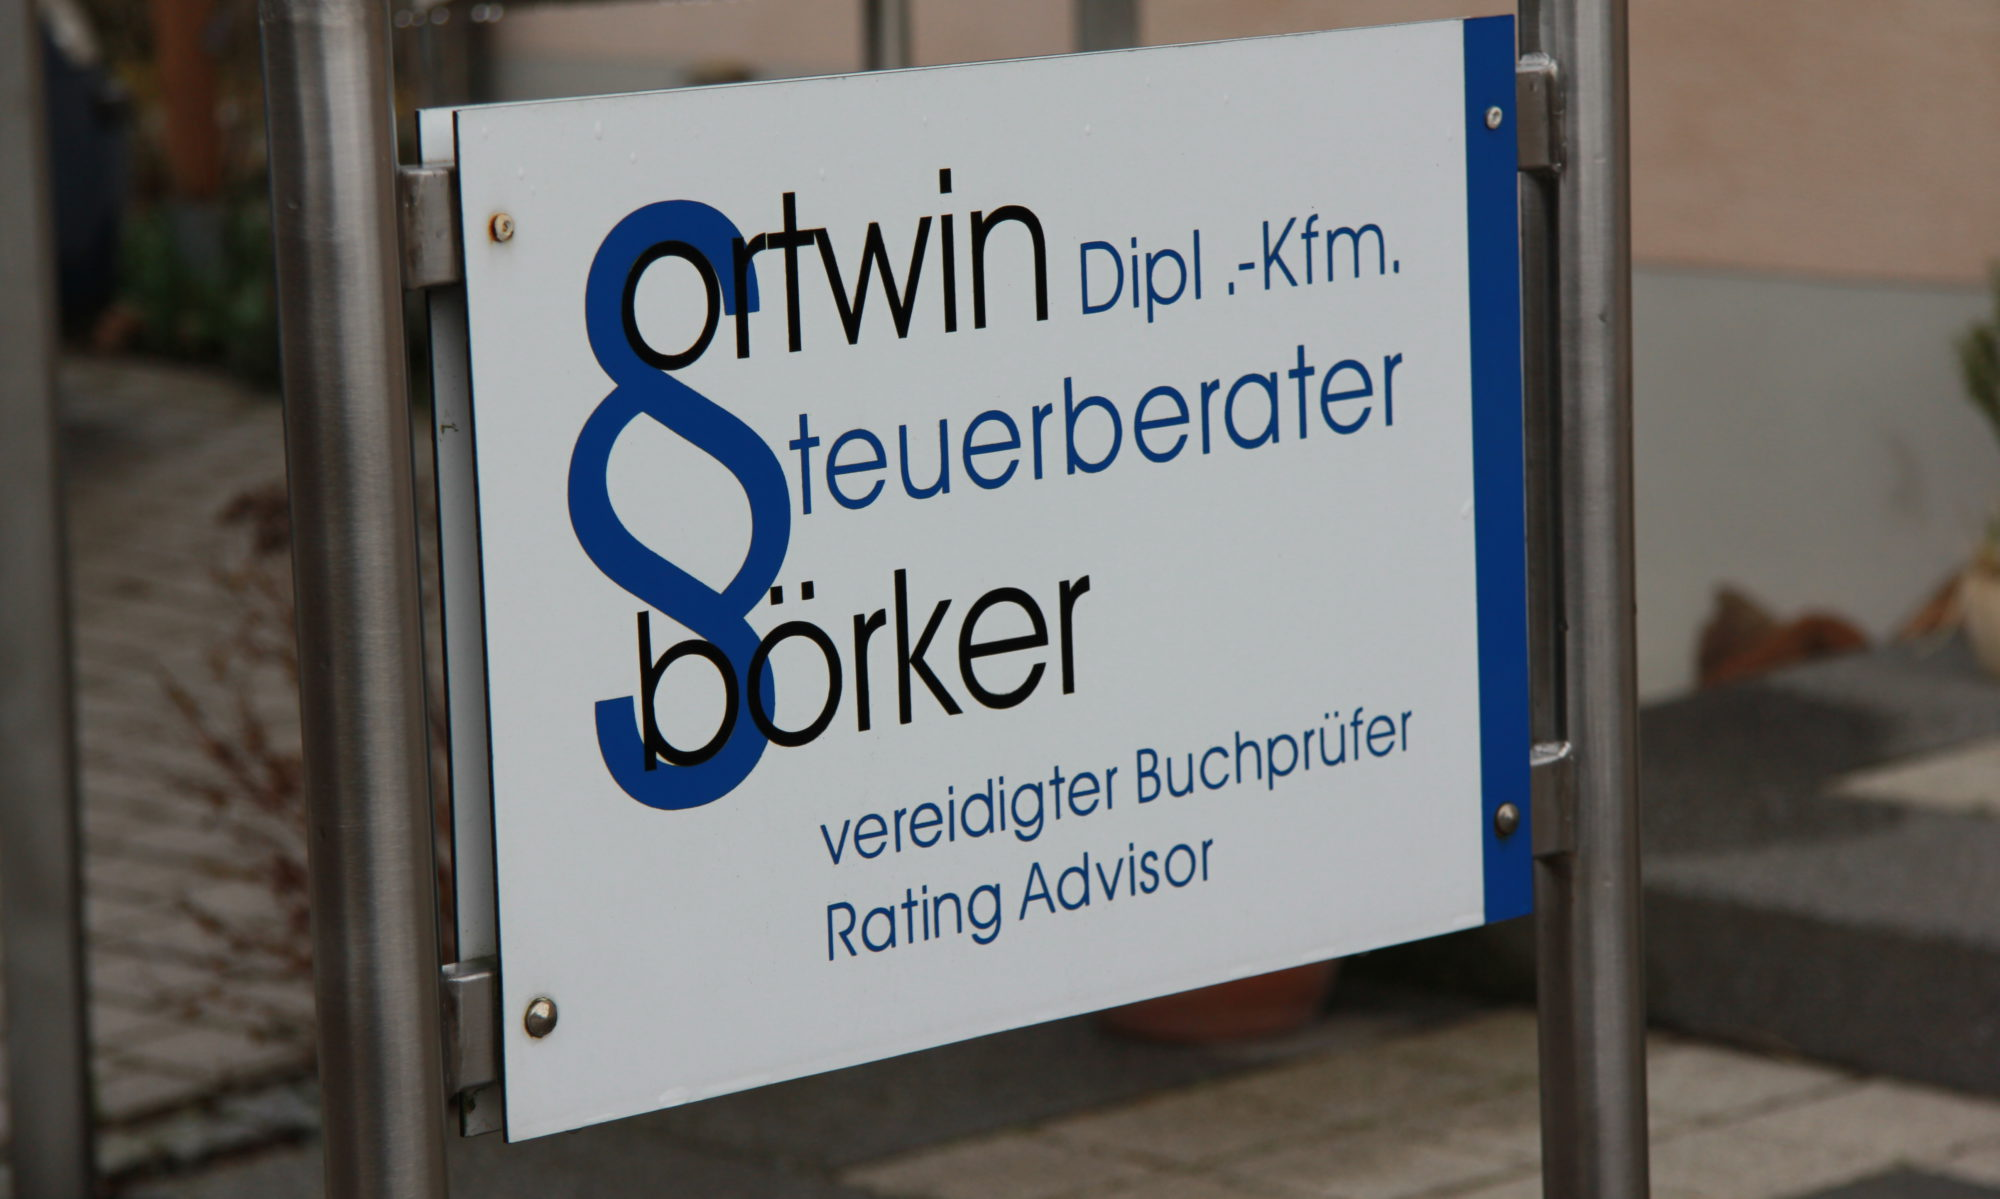 Steuerbüro Börker